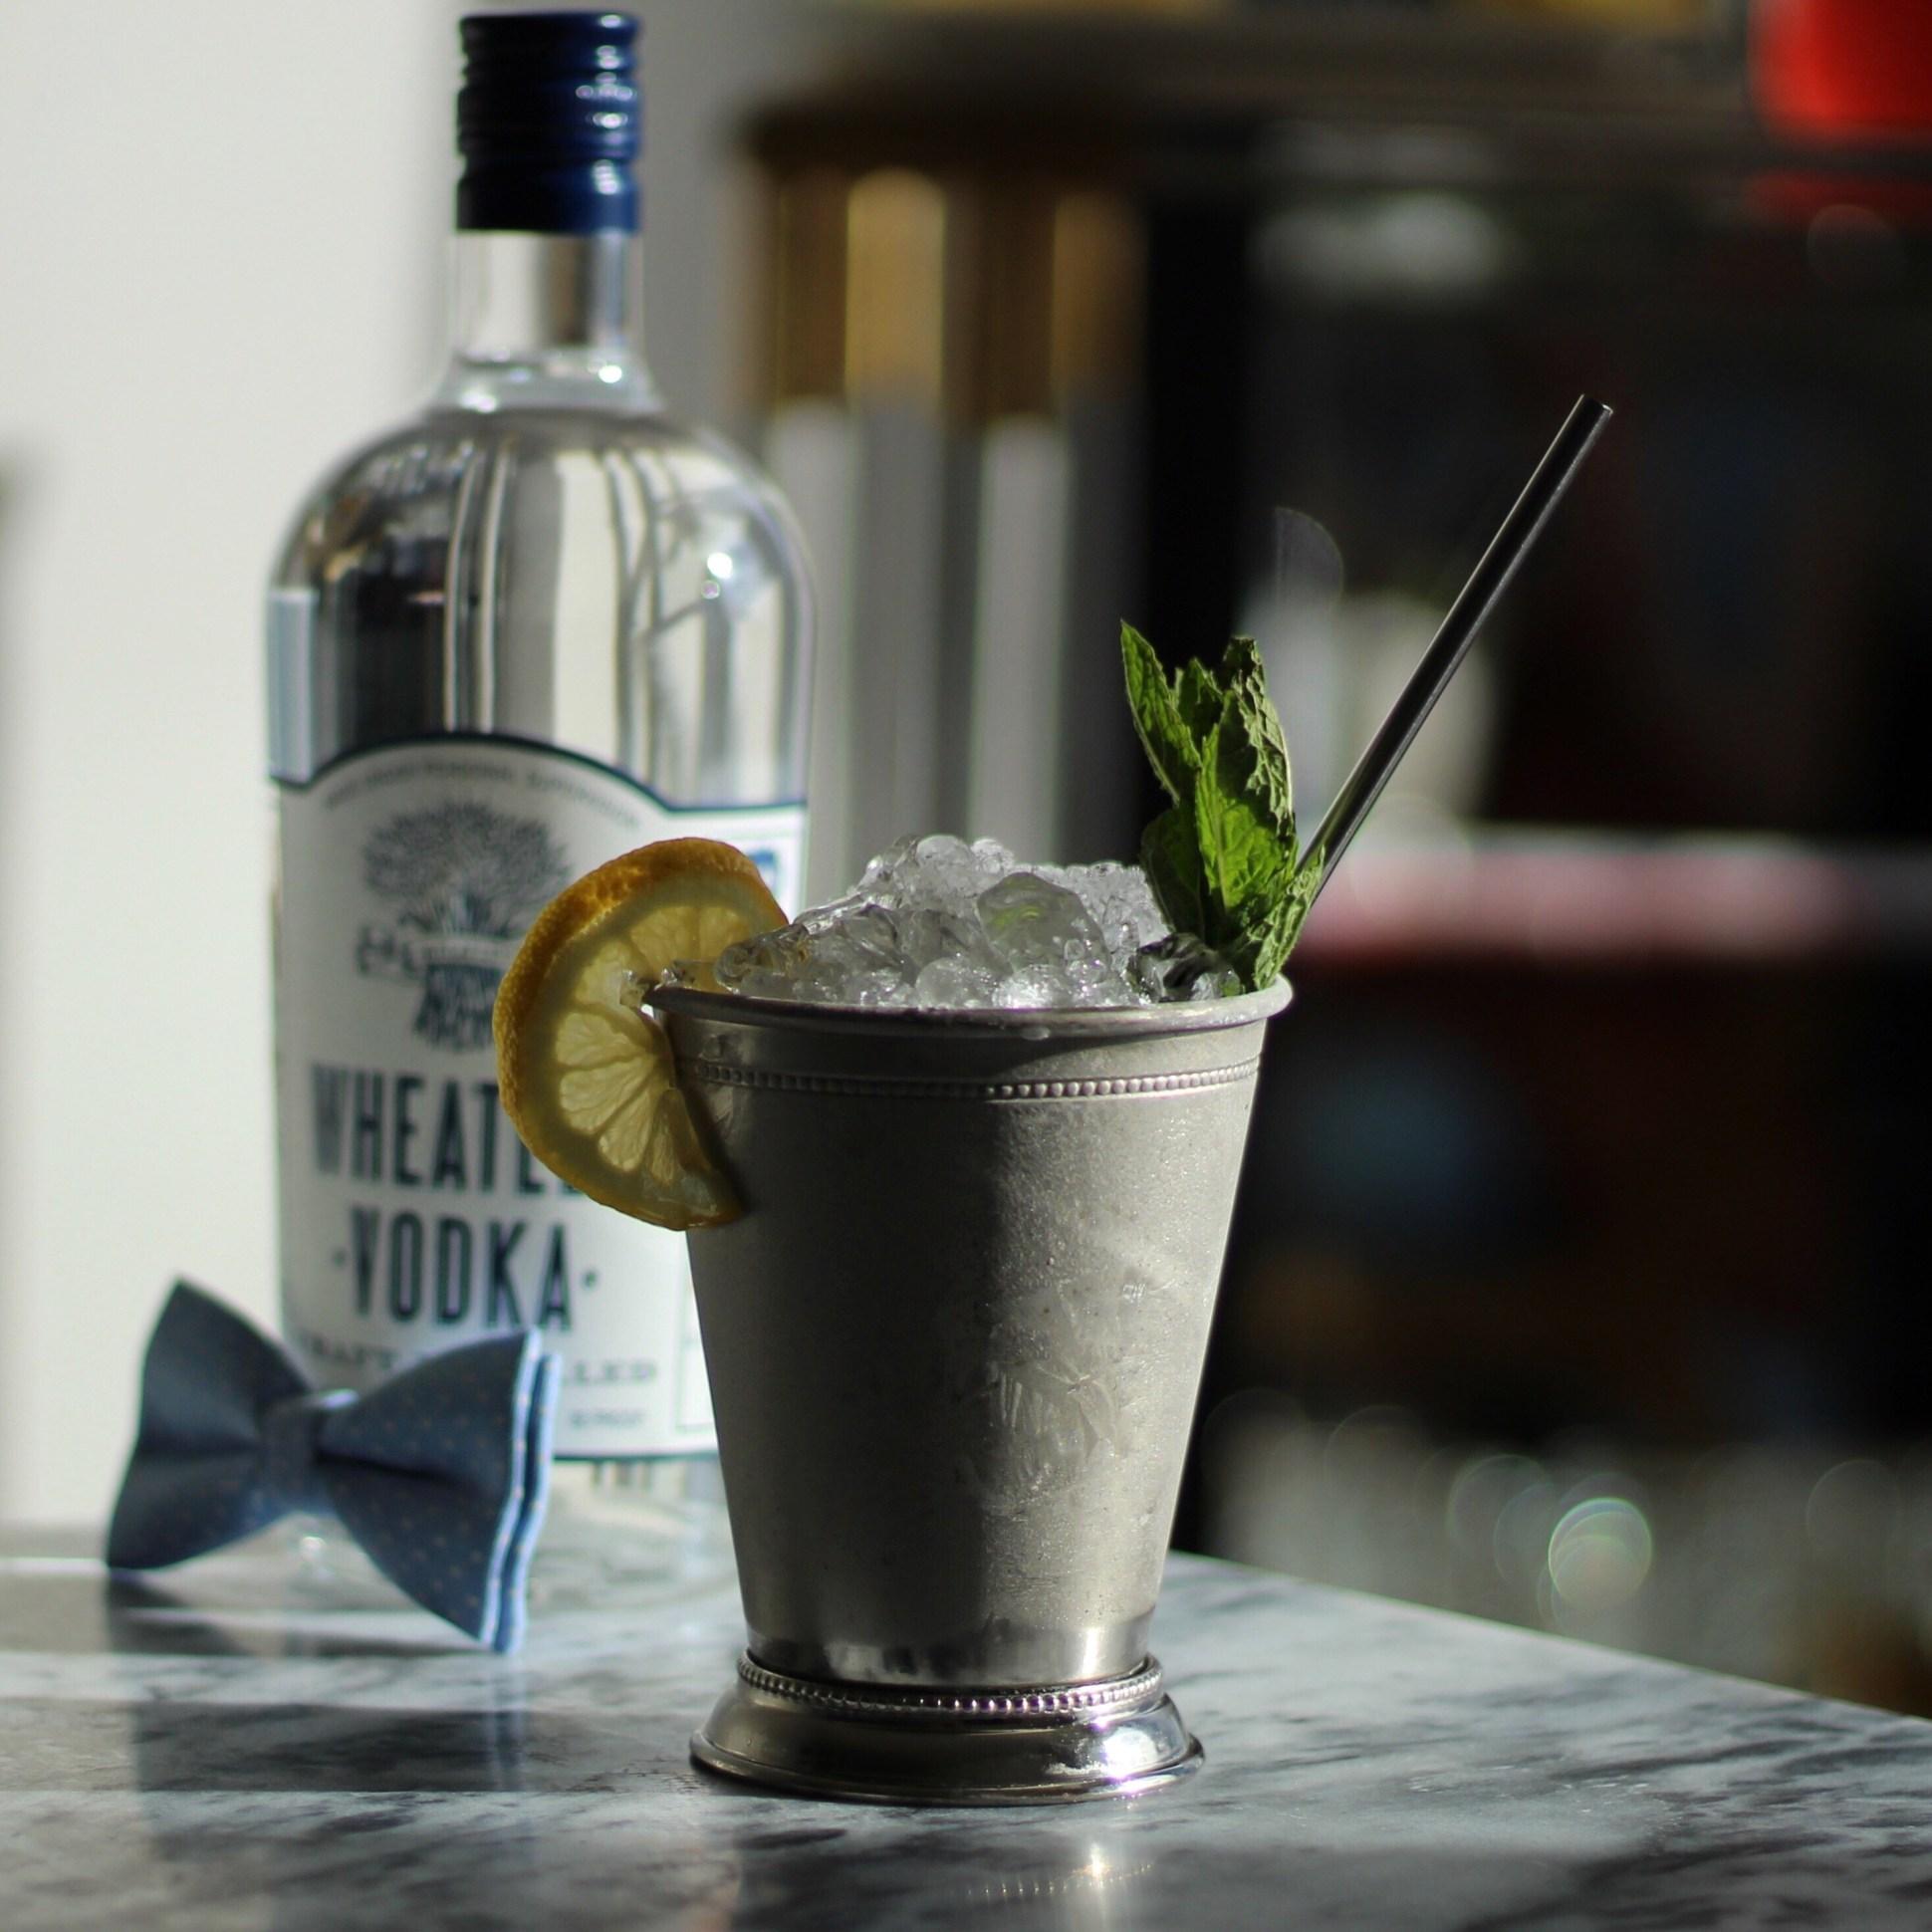 wheatley vodka sweet tea mint julep -